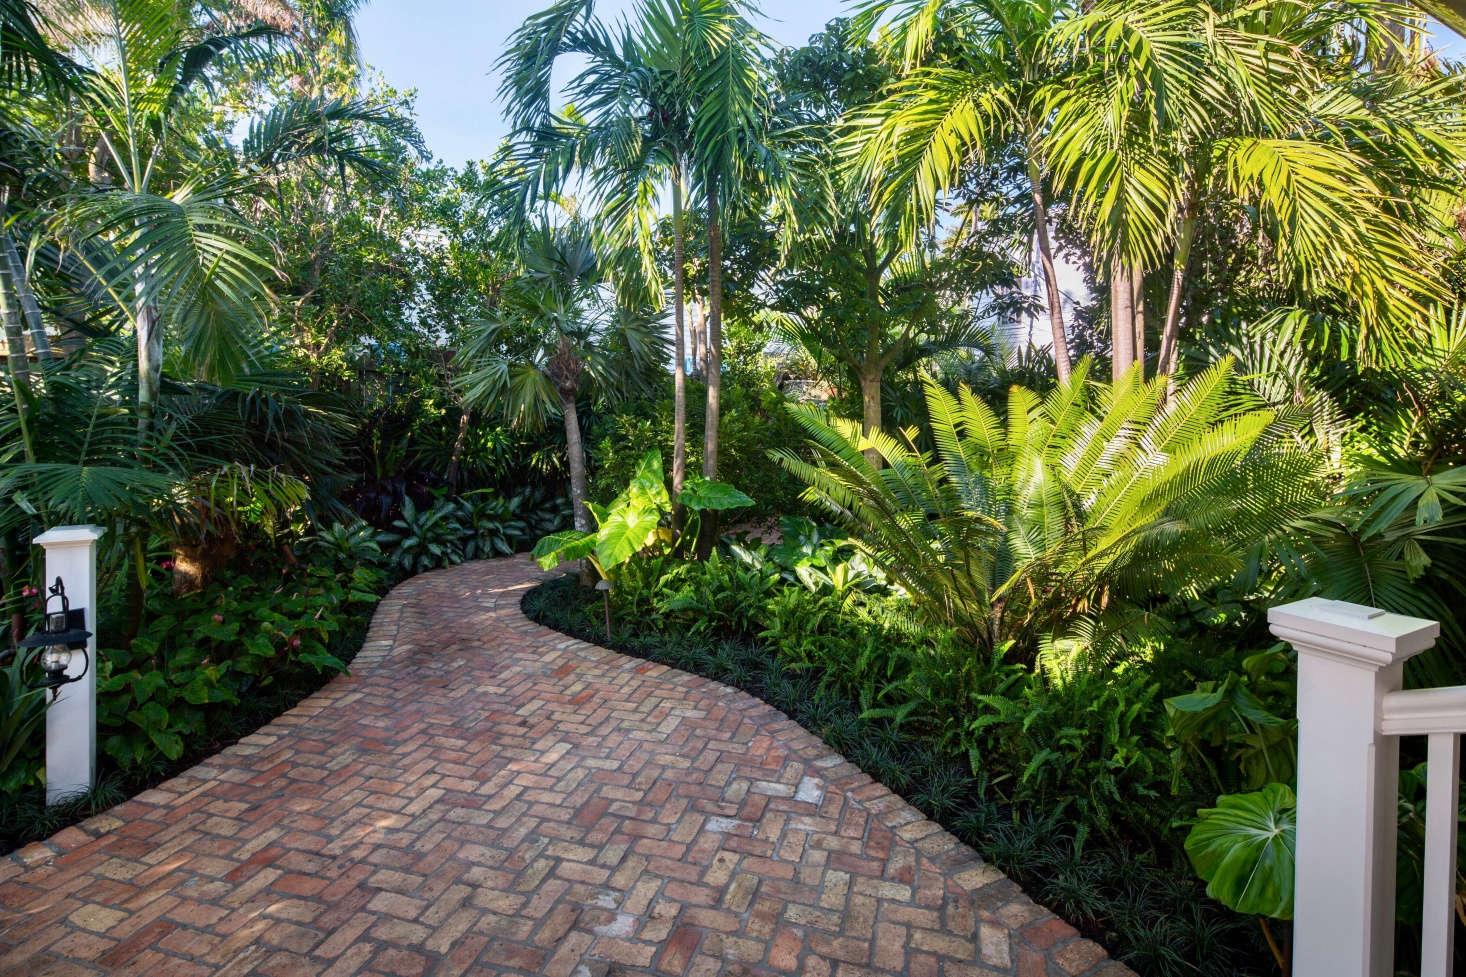 Key West S Secret Garden A Modern Landscape For An Author S